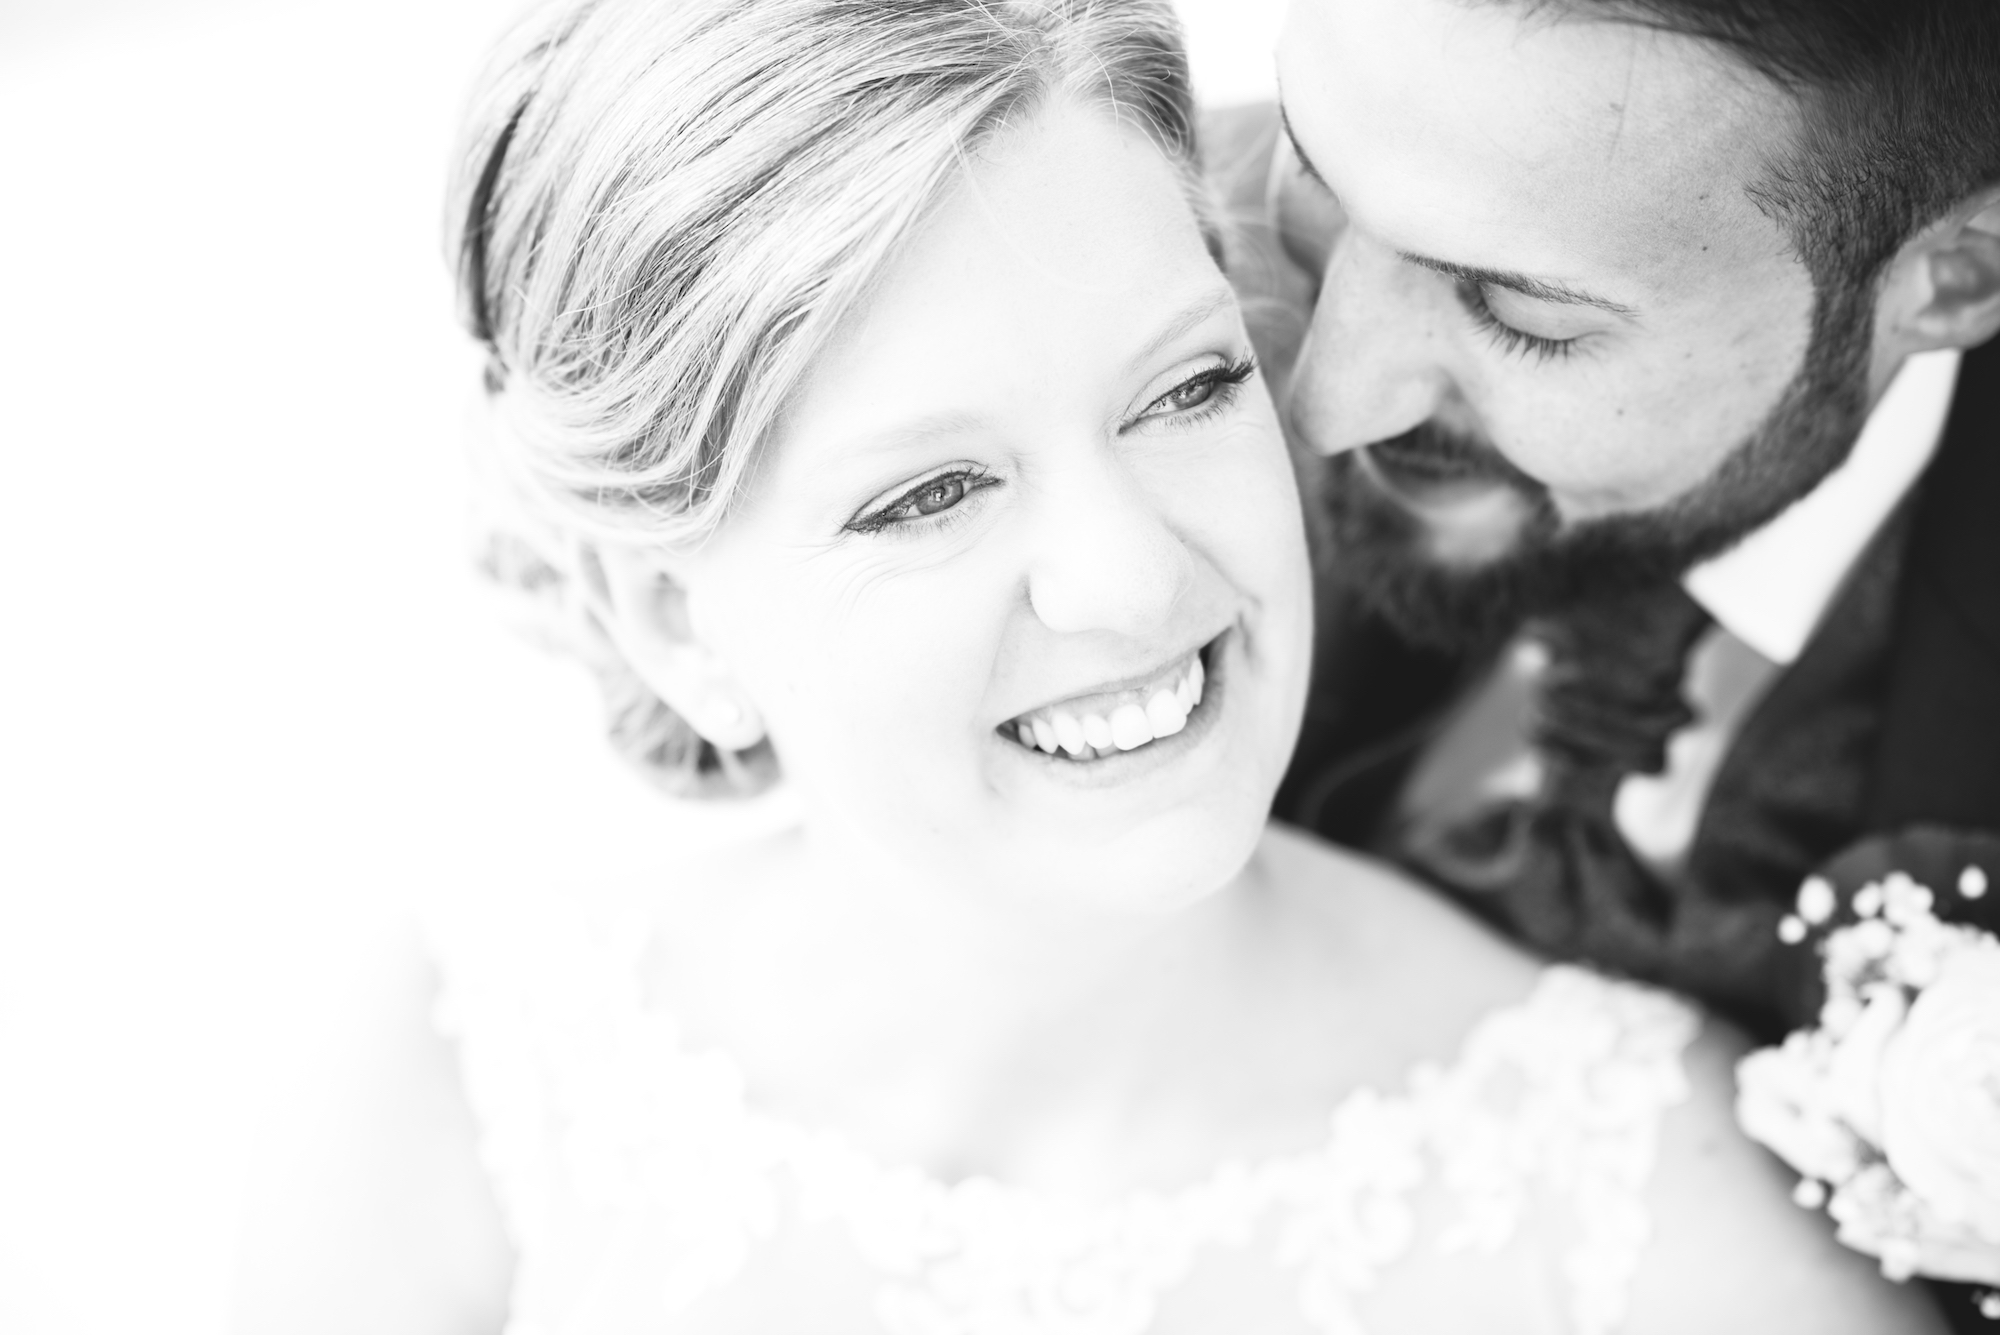 NadiaundMichael_Hochzeit_BekaBitterliFotografie_385.jpg